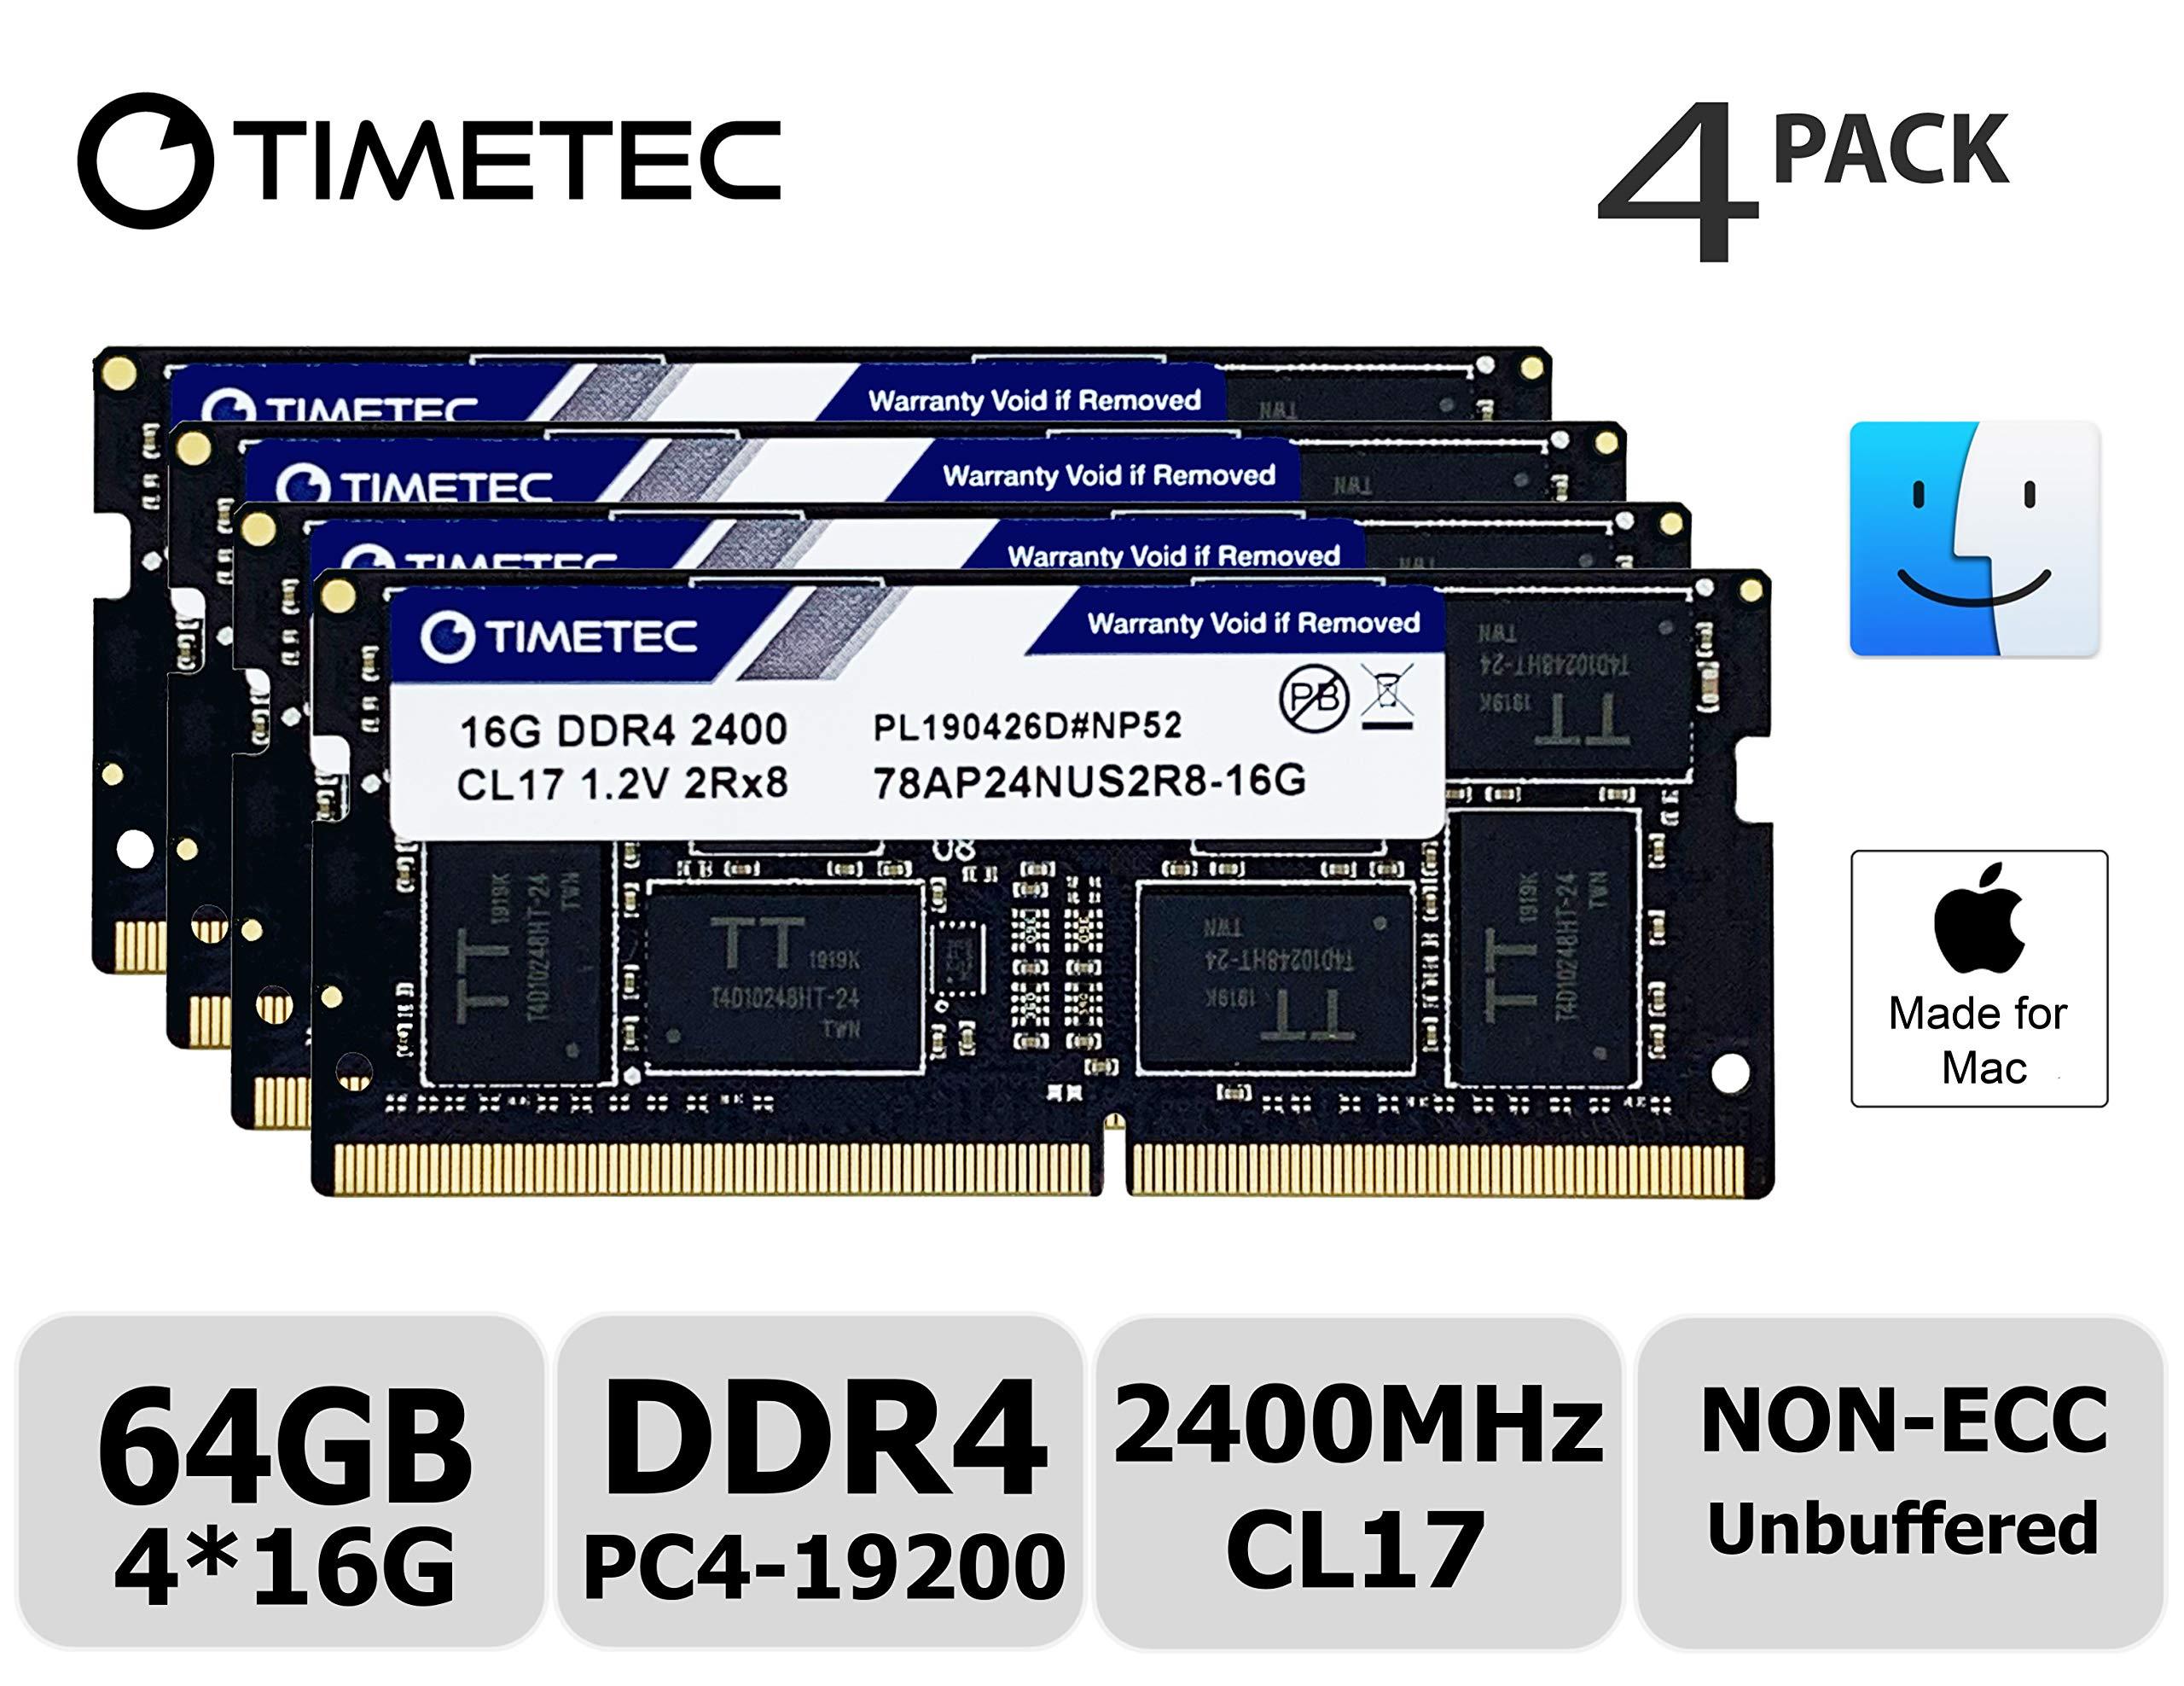 Memoria Ram 64gb Timetec Hynix Ic Kit (4x16gb) Compatible Para Apple 2017 iMac 27-inch W/retina 5k Display Ddr4 2400mhz